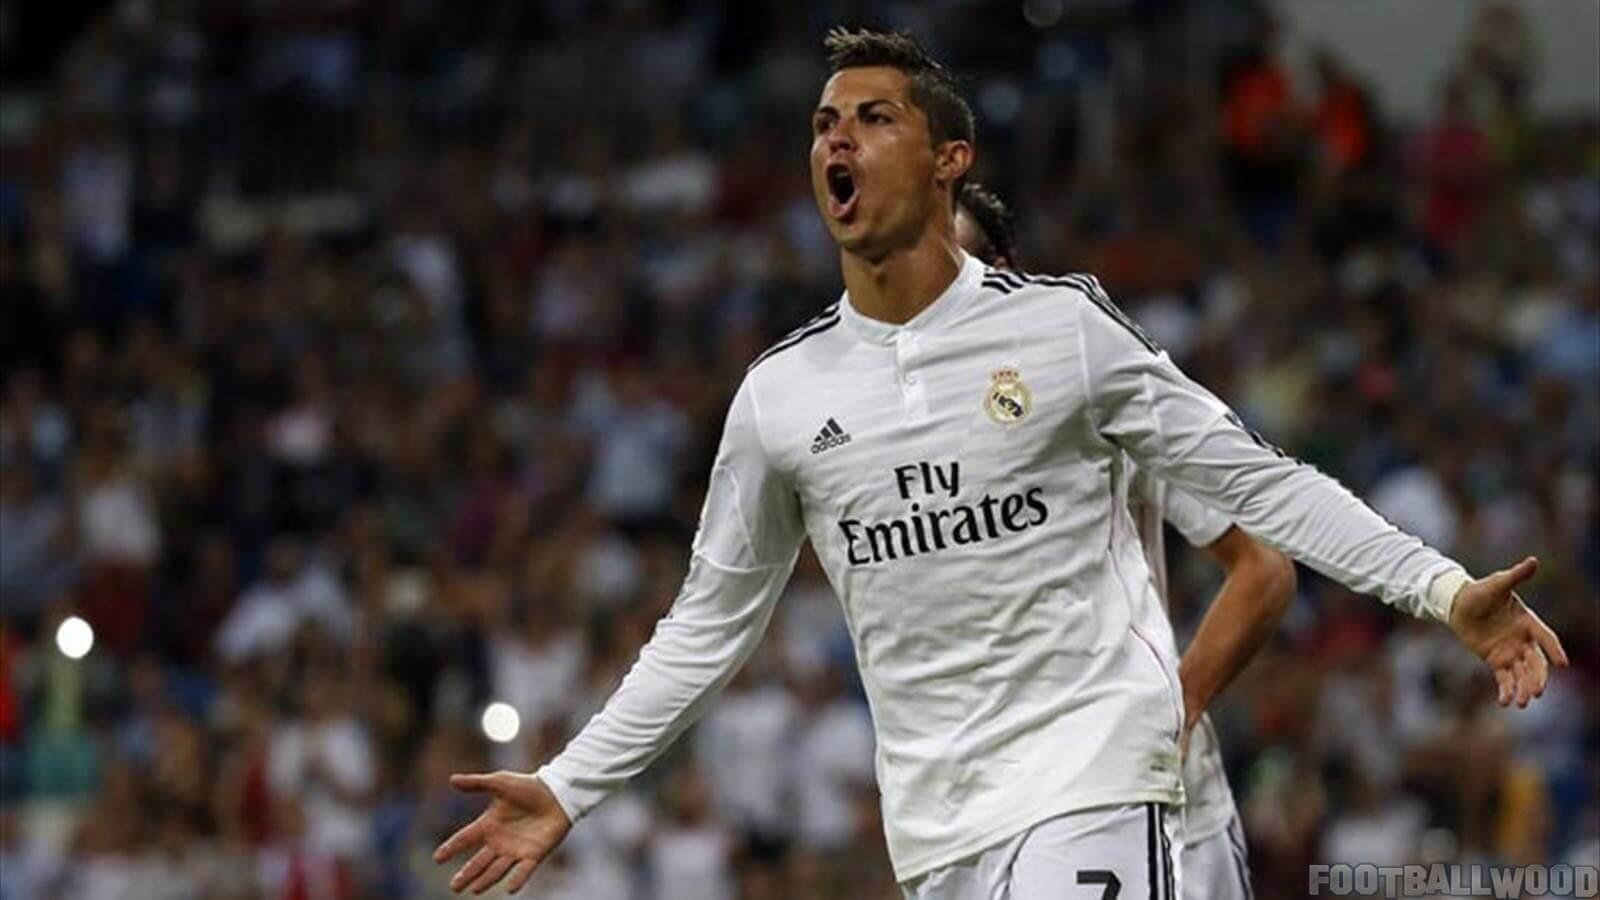 Cristiano Ronaldo: Not All My Goals Are Penalties